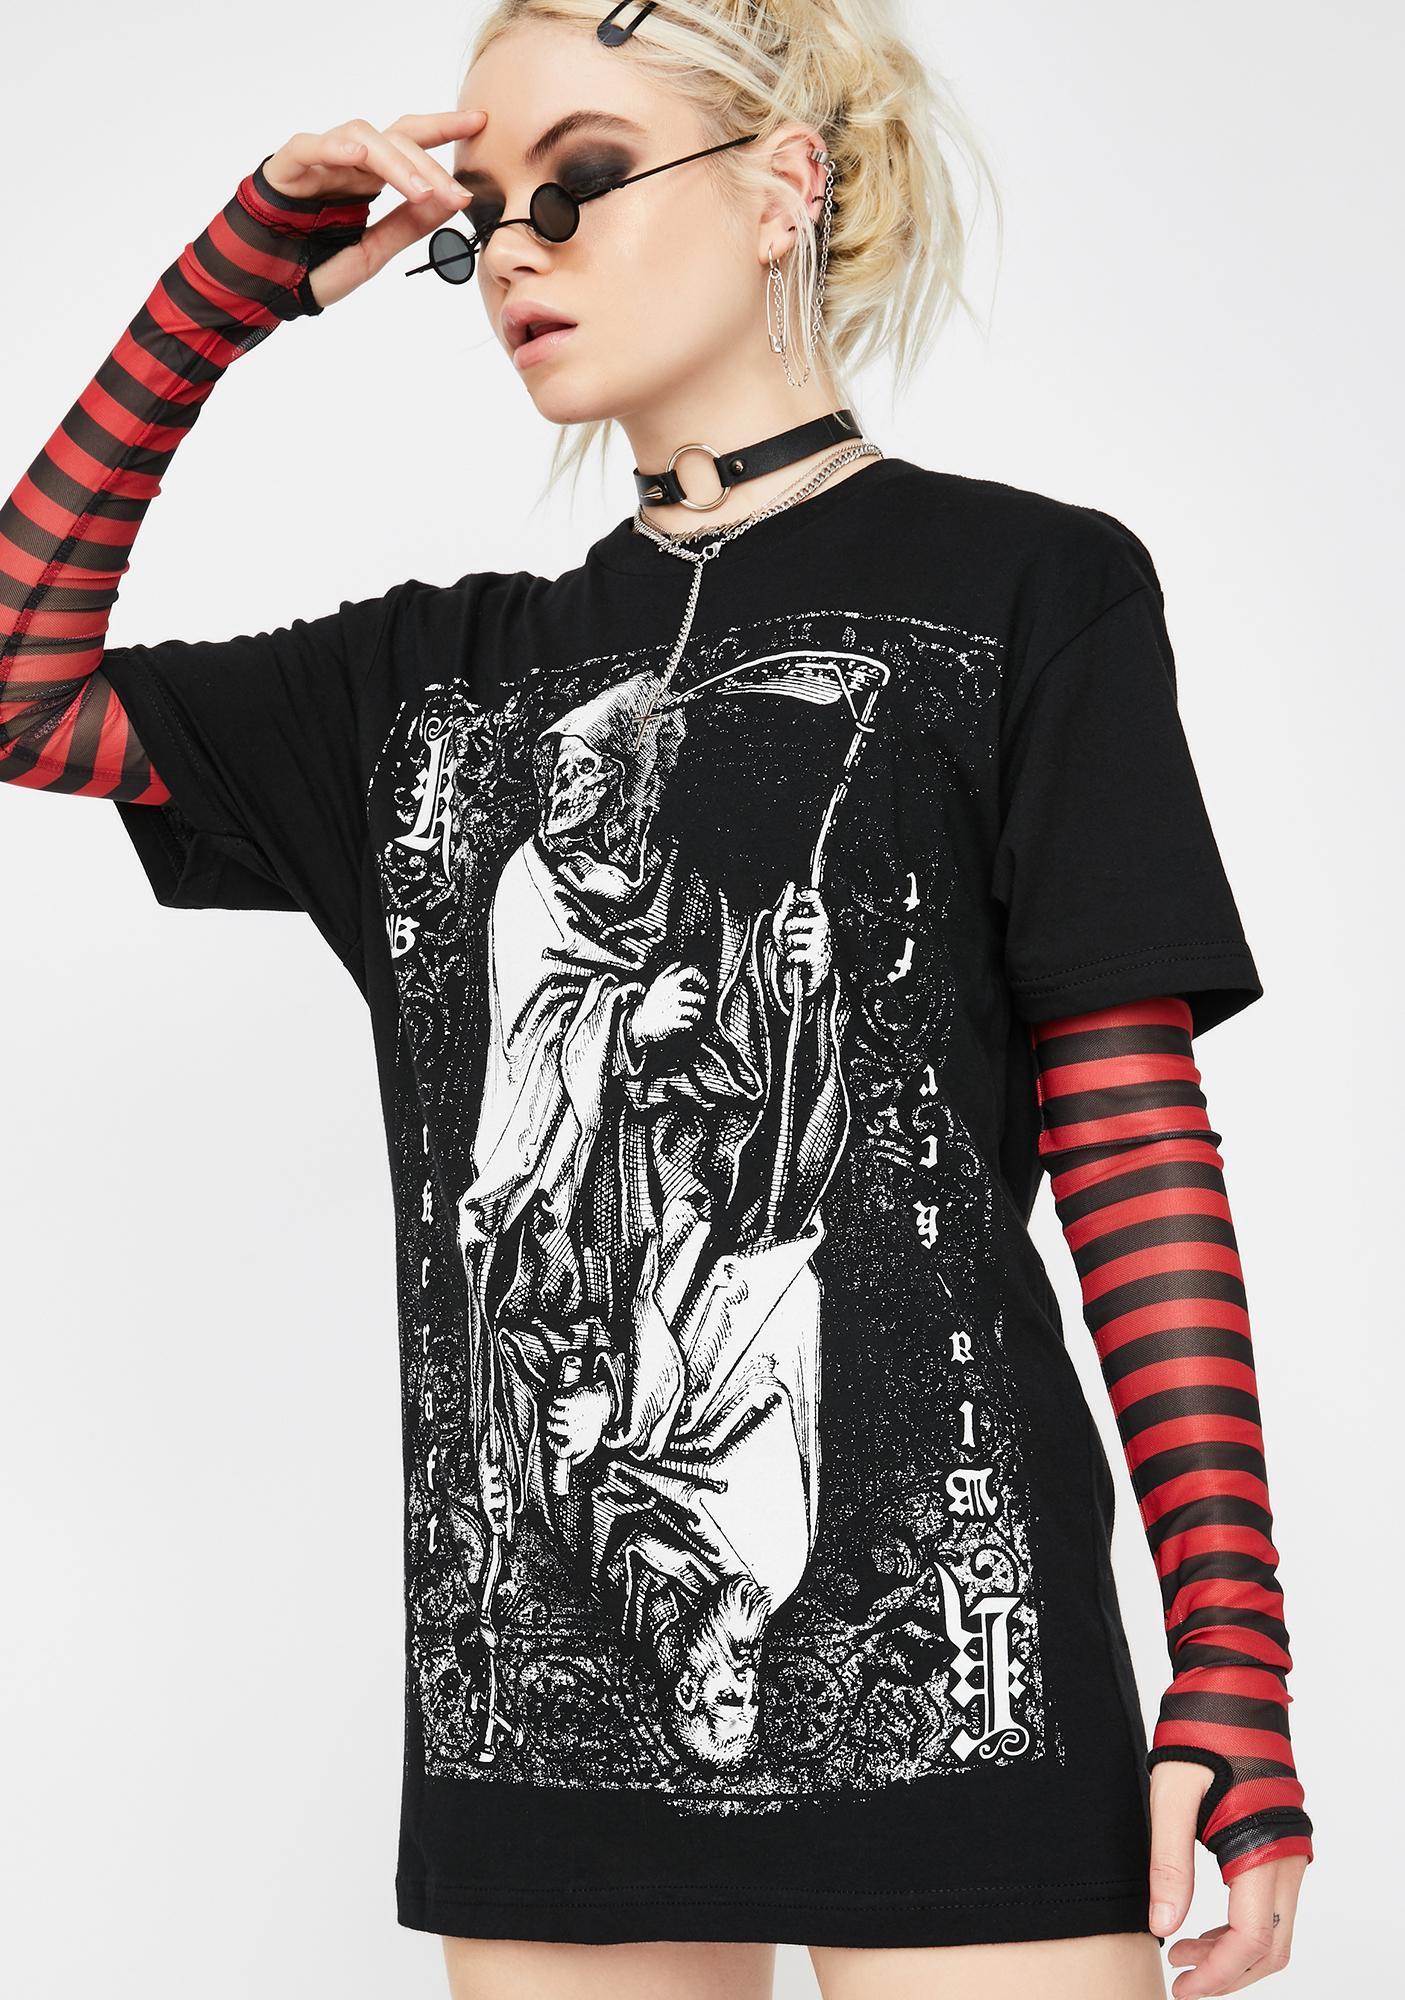 Blackcraft Death To Gods Graphic Tee